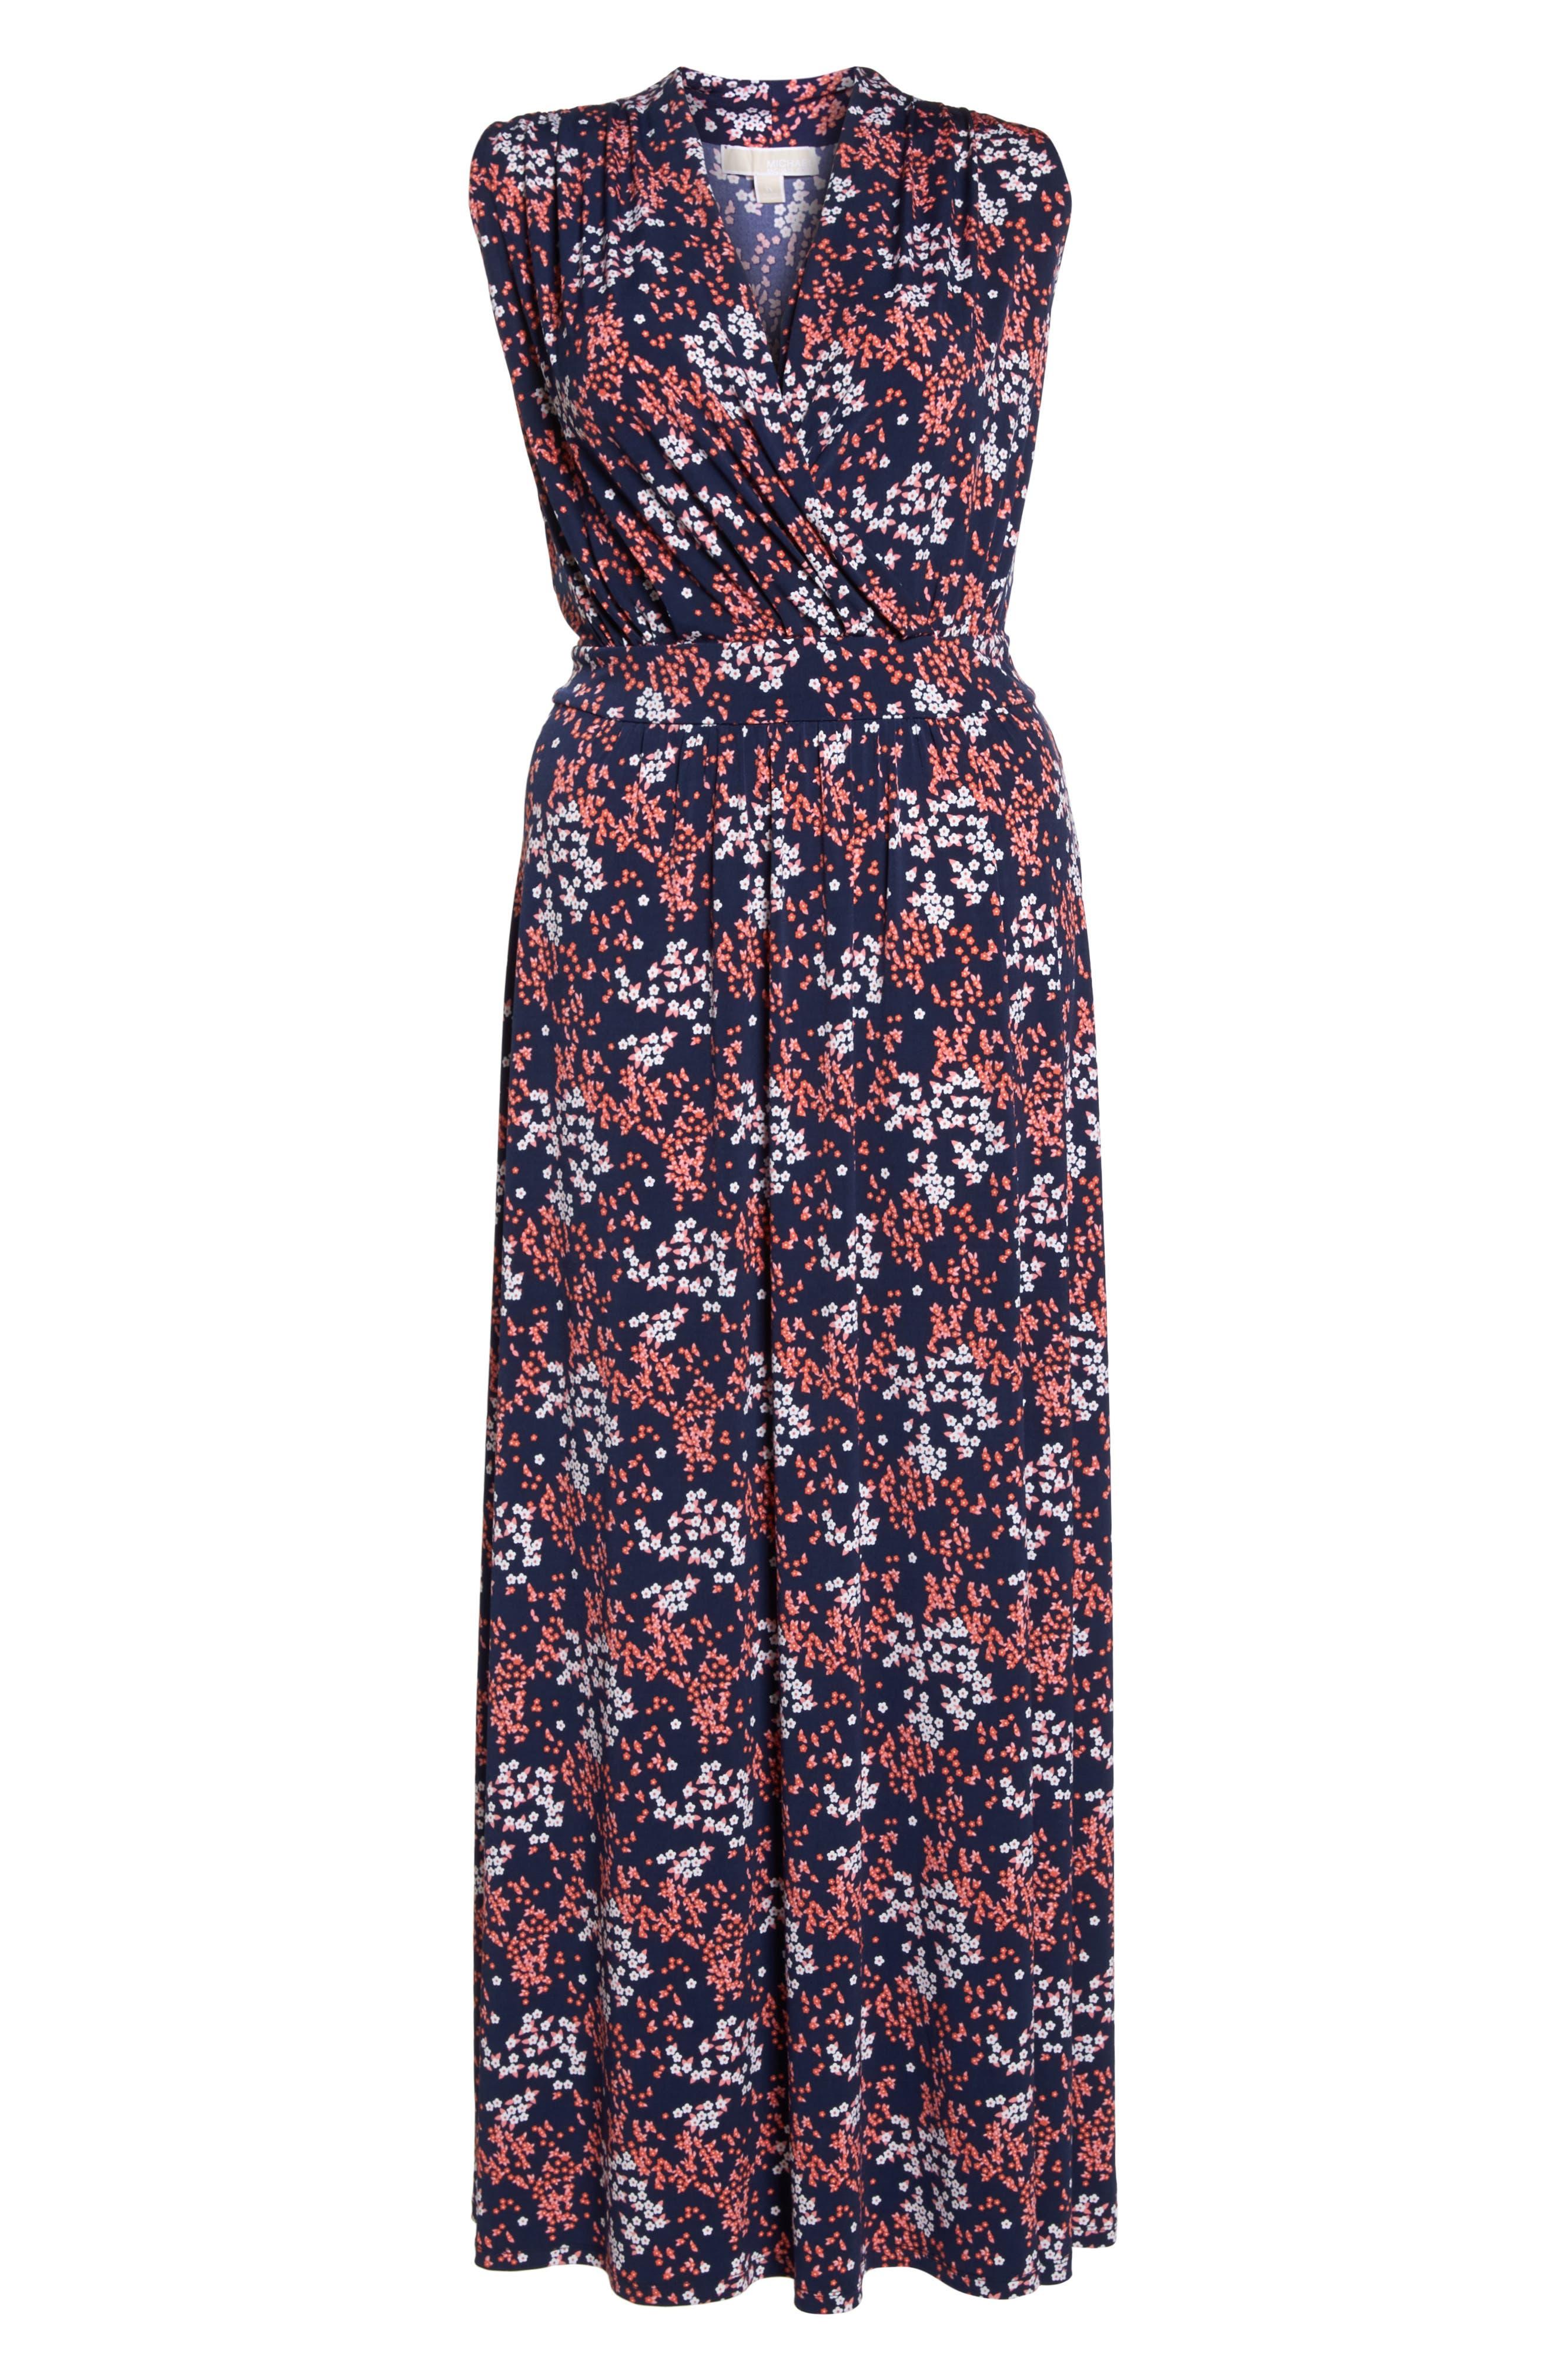 Floral Print Maxi Dress,                             Alternate thumbnail 7, color,                             671